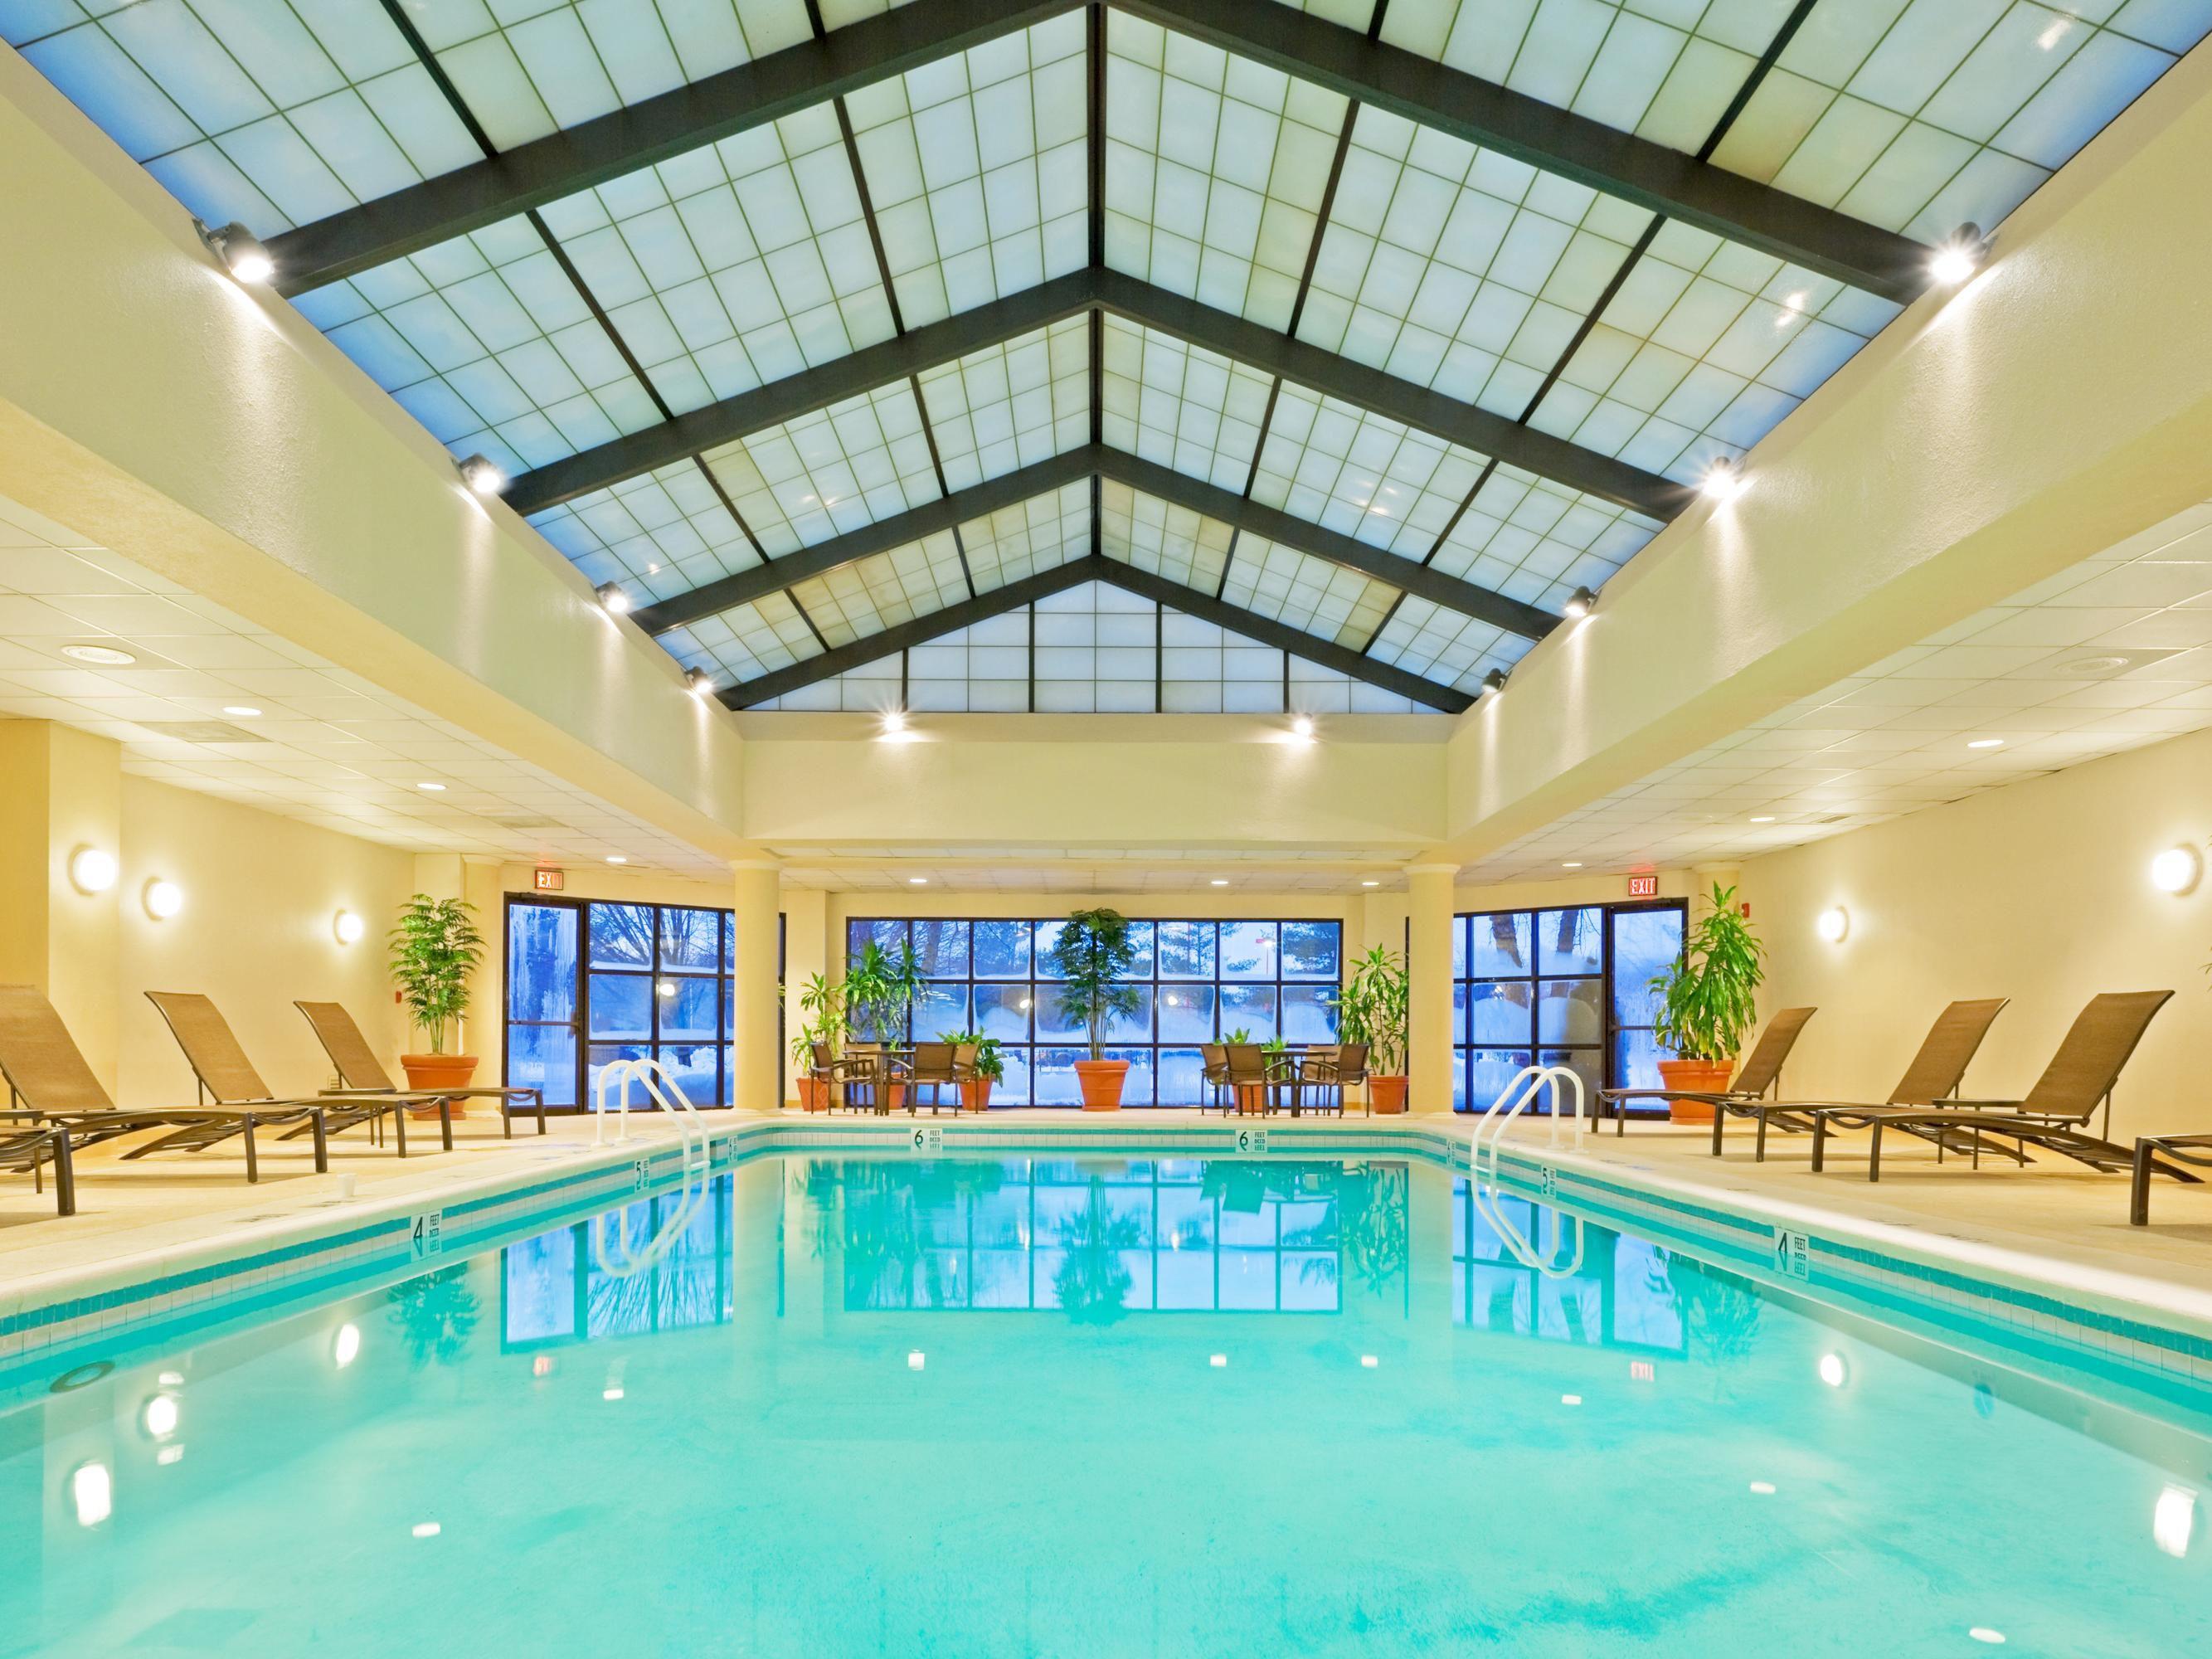 crowne plaza fairfield hotel 2018 world 39 s best hotels. Black Bedroom Furniture Sets. Home Design Ideas